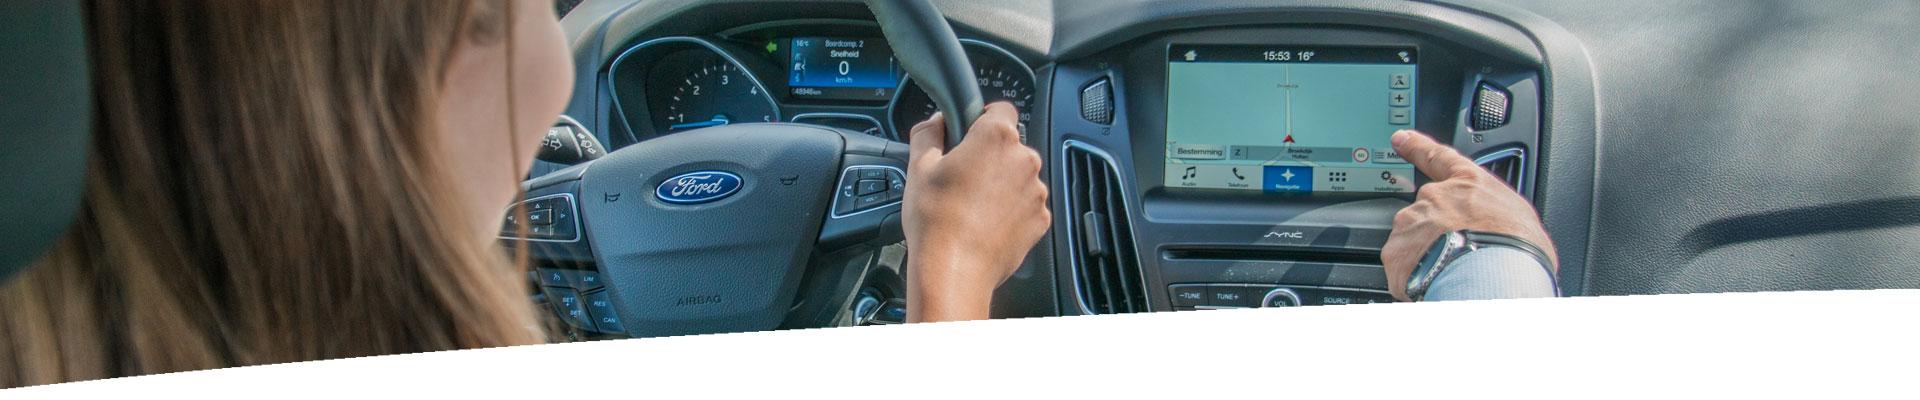 Proefles Autorijschool Keep Driving